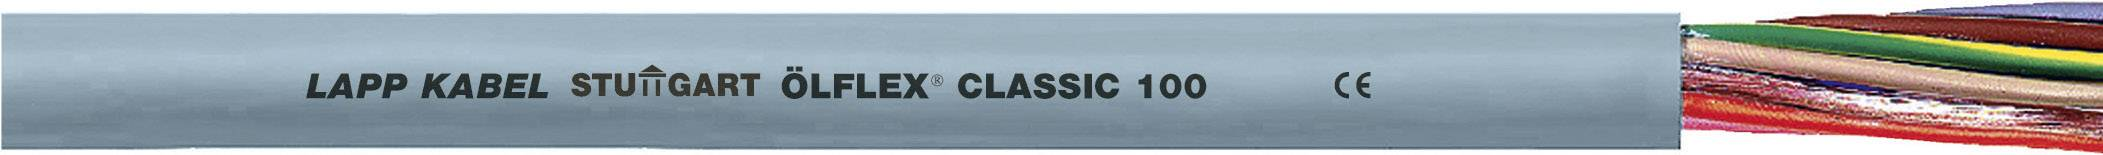 Kabel LappKabel Ölflex CLASSIC 100 4X0,5 (00101234), PVC, 5,7 mm, 500 V, šedá, 1000 m